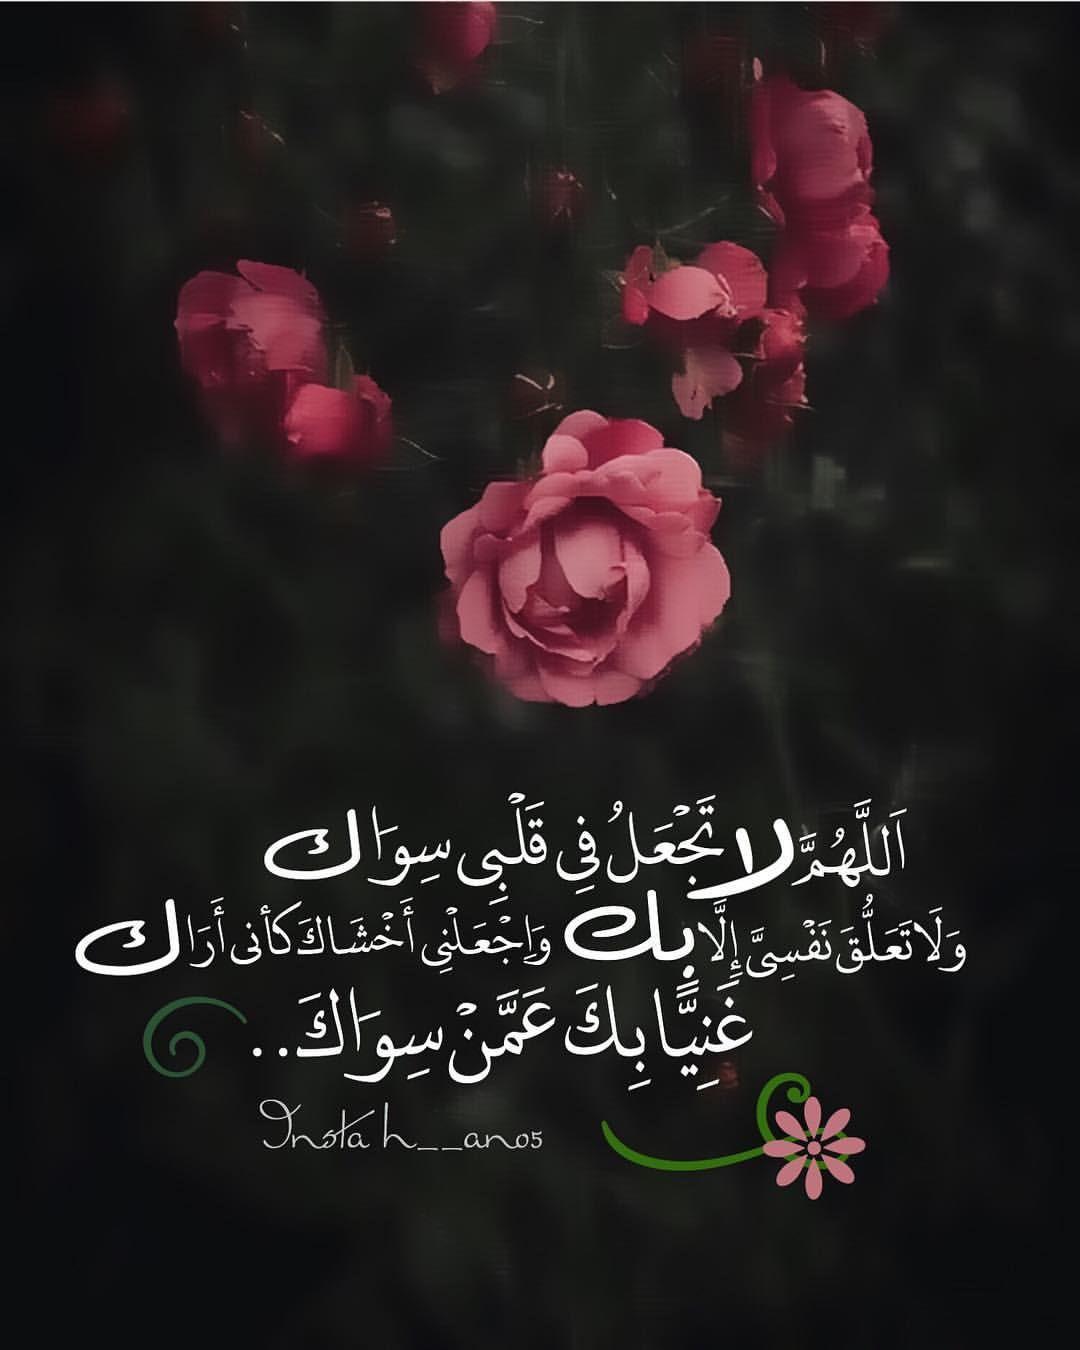 267 Likes 13 Comments مصممة H Ano5 On Instagram تصميمي تصاميم مصممات مصممين رمزيات خواطر خطوط Islamic Quotes Quran Holy Quran Islamic Images